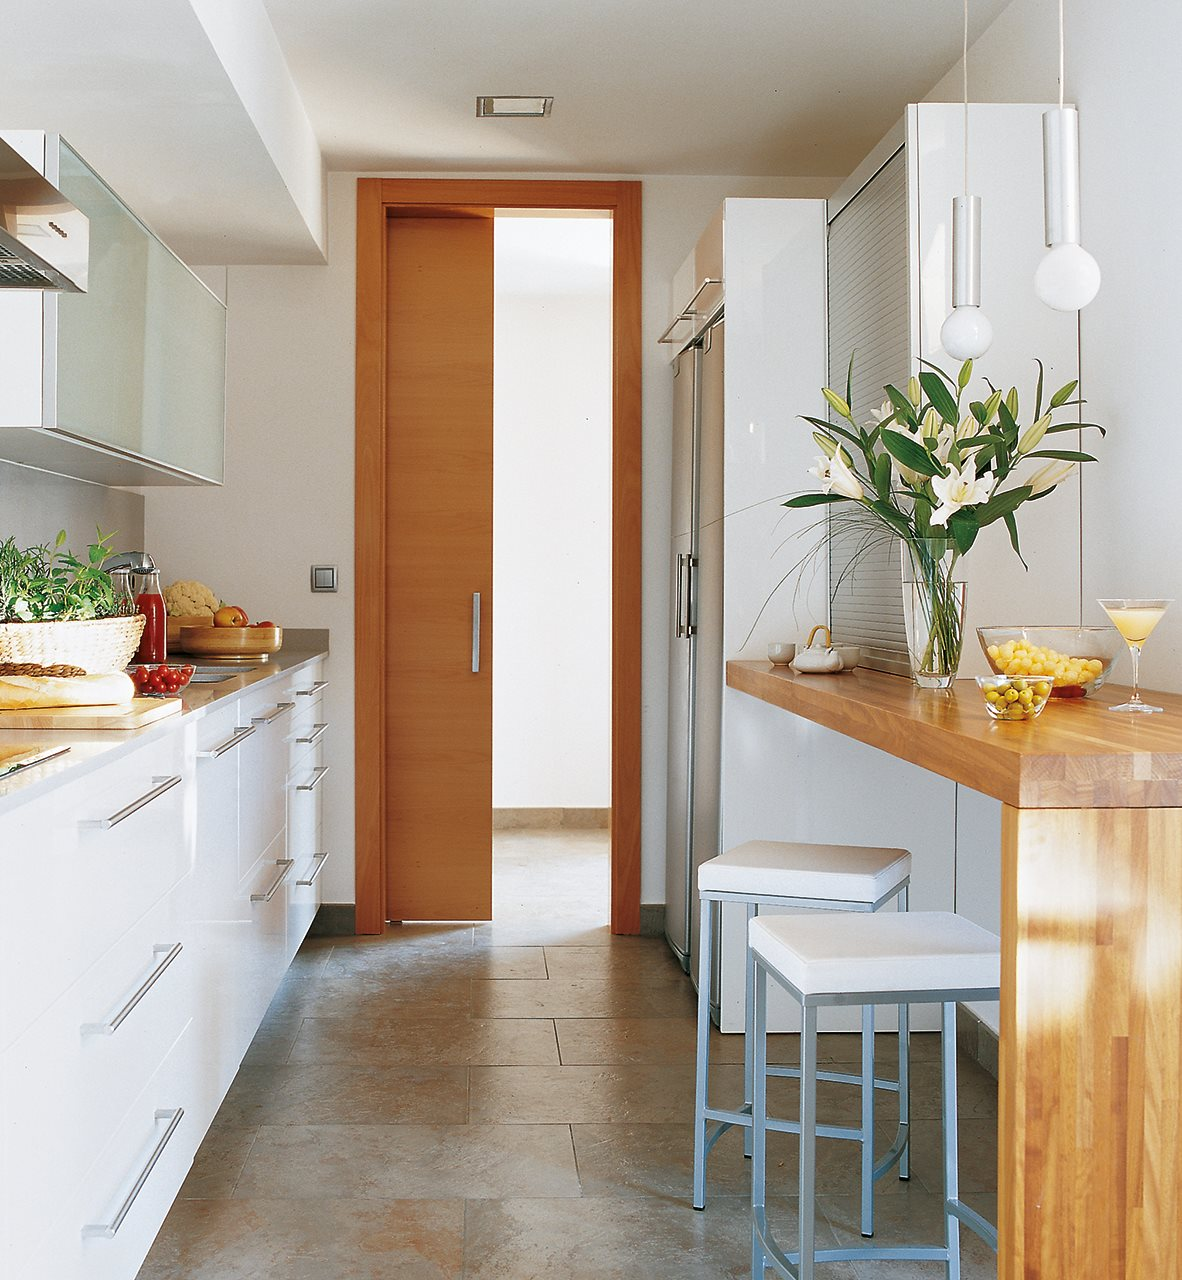 Los 9 mejores dise os de cocinas office for Comedores para cocinas pequenas